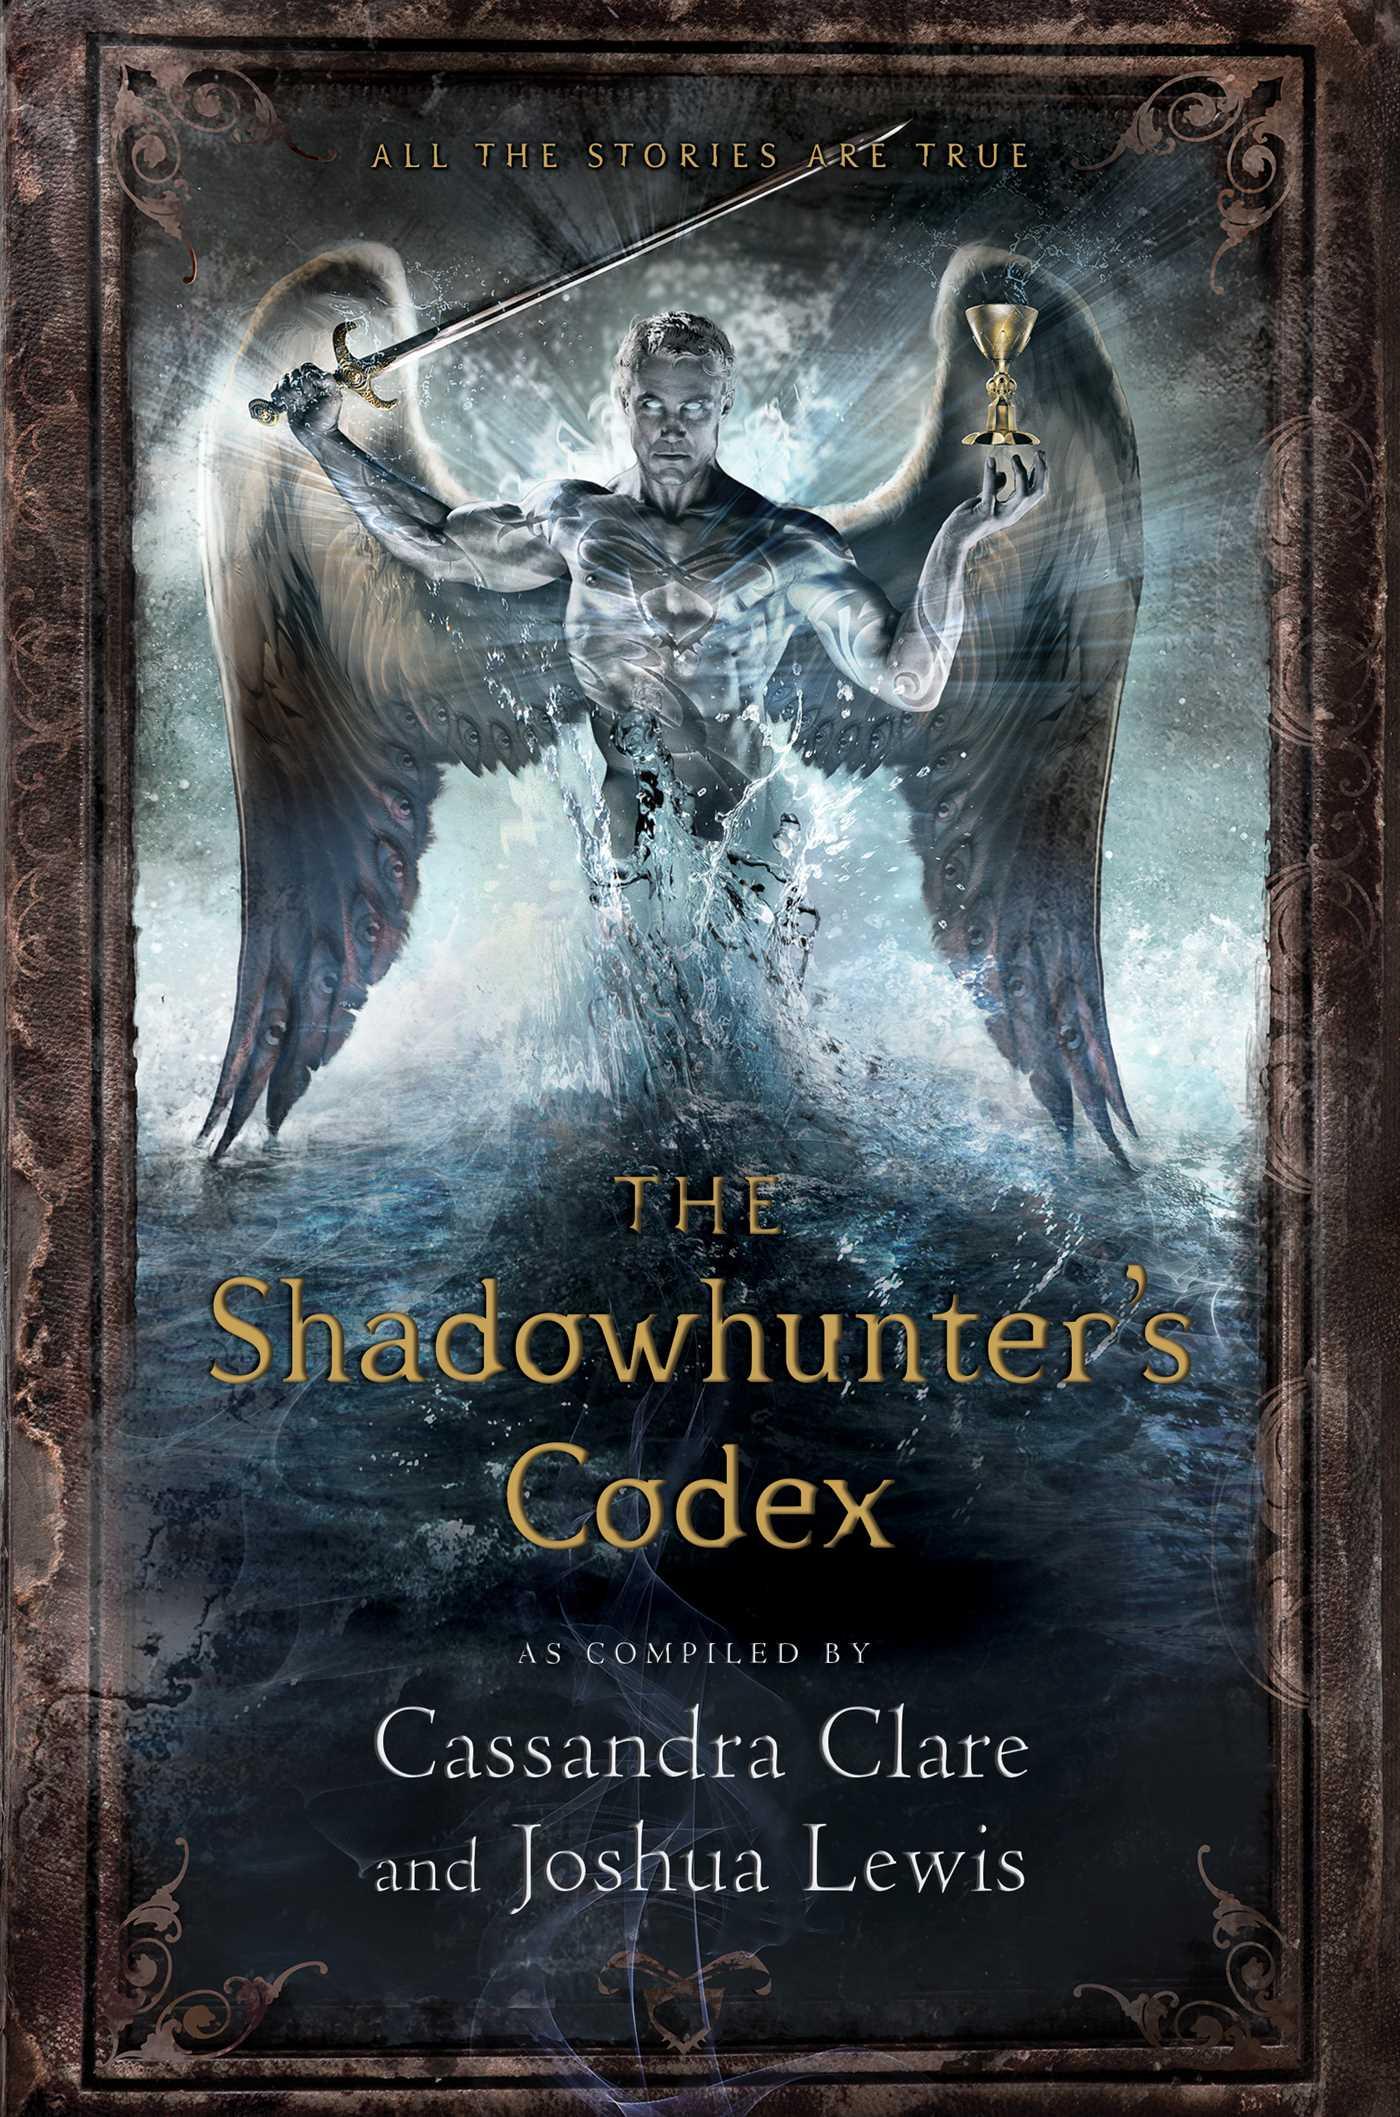 The shadowhunters codex 9781442416925 hr